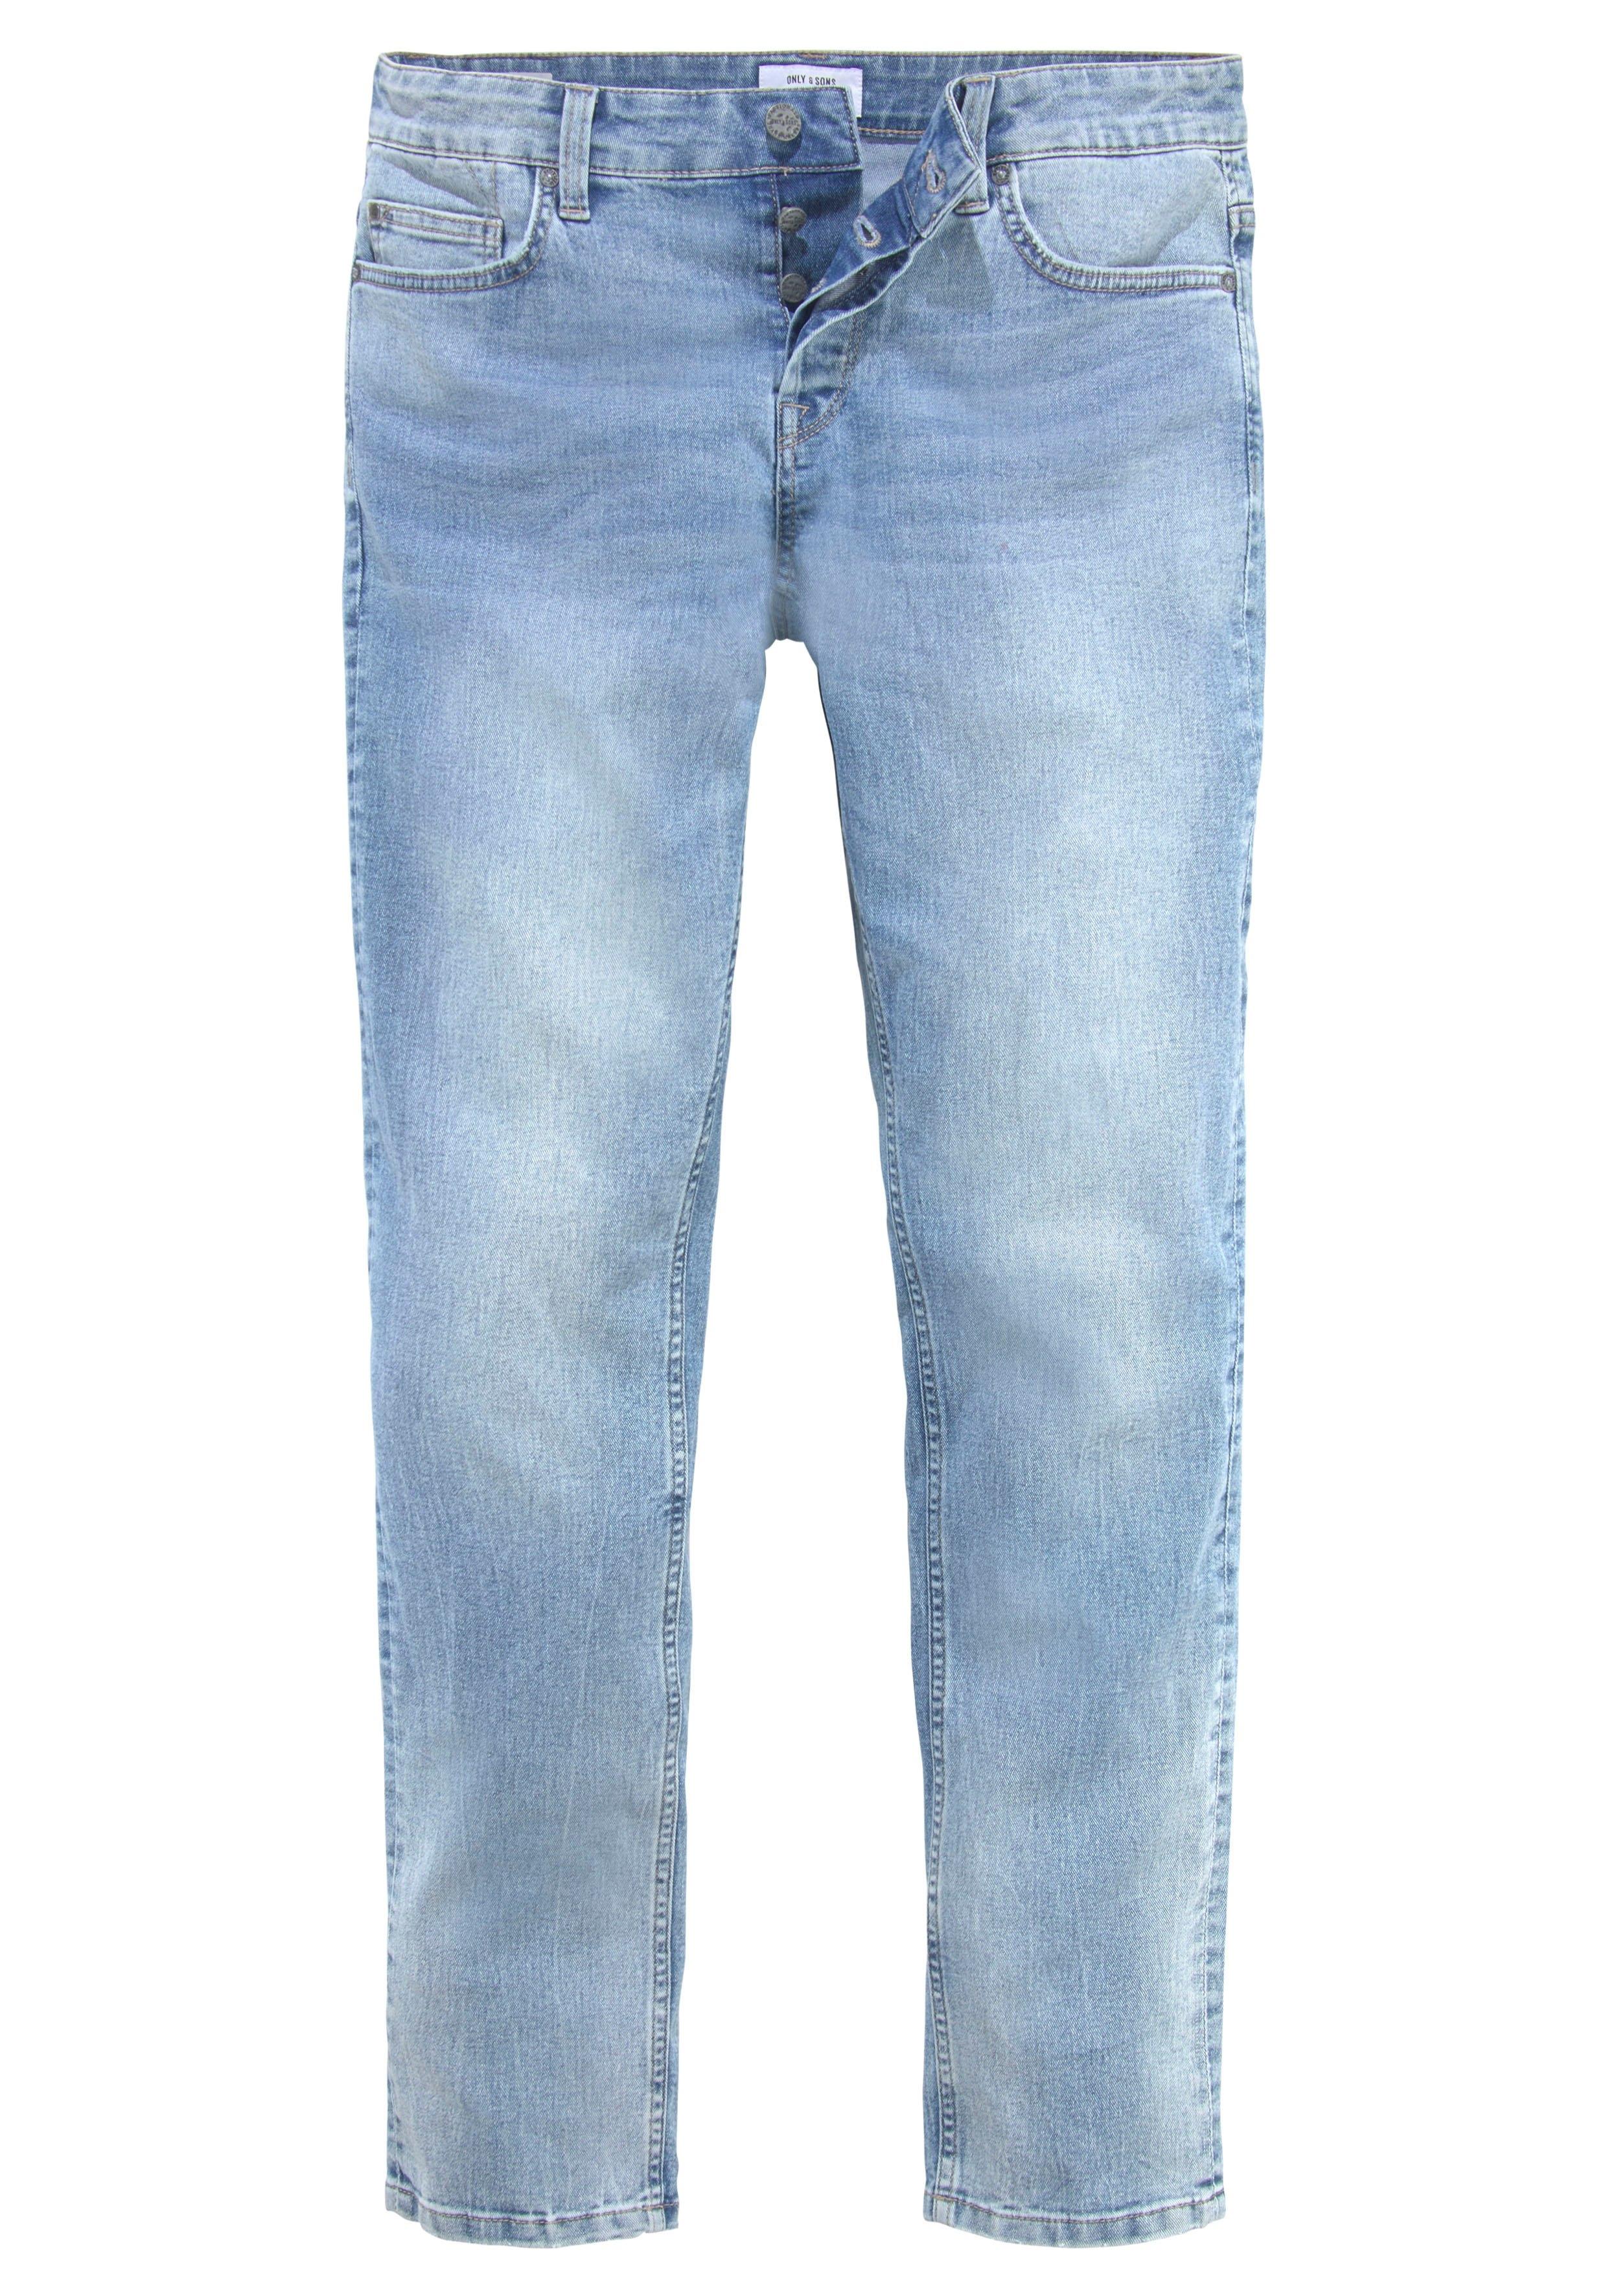 ONLY & SONS slim fit jeans Loom - verschillende betaalmethodes